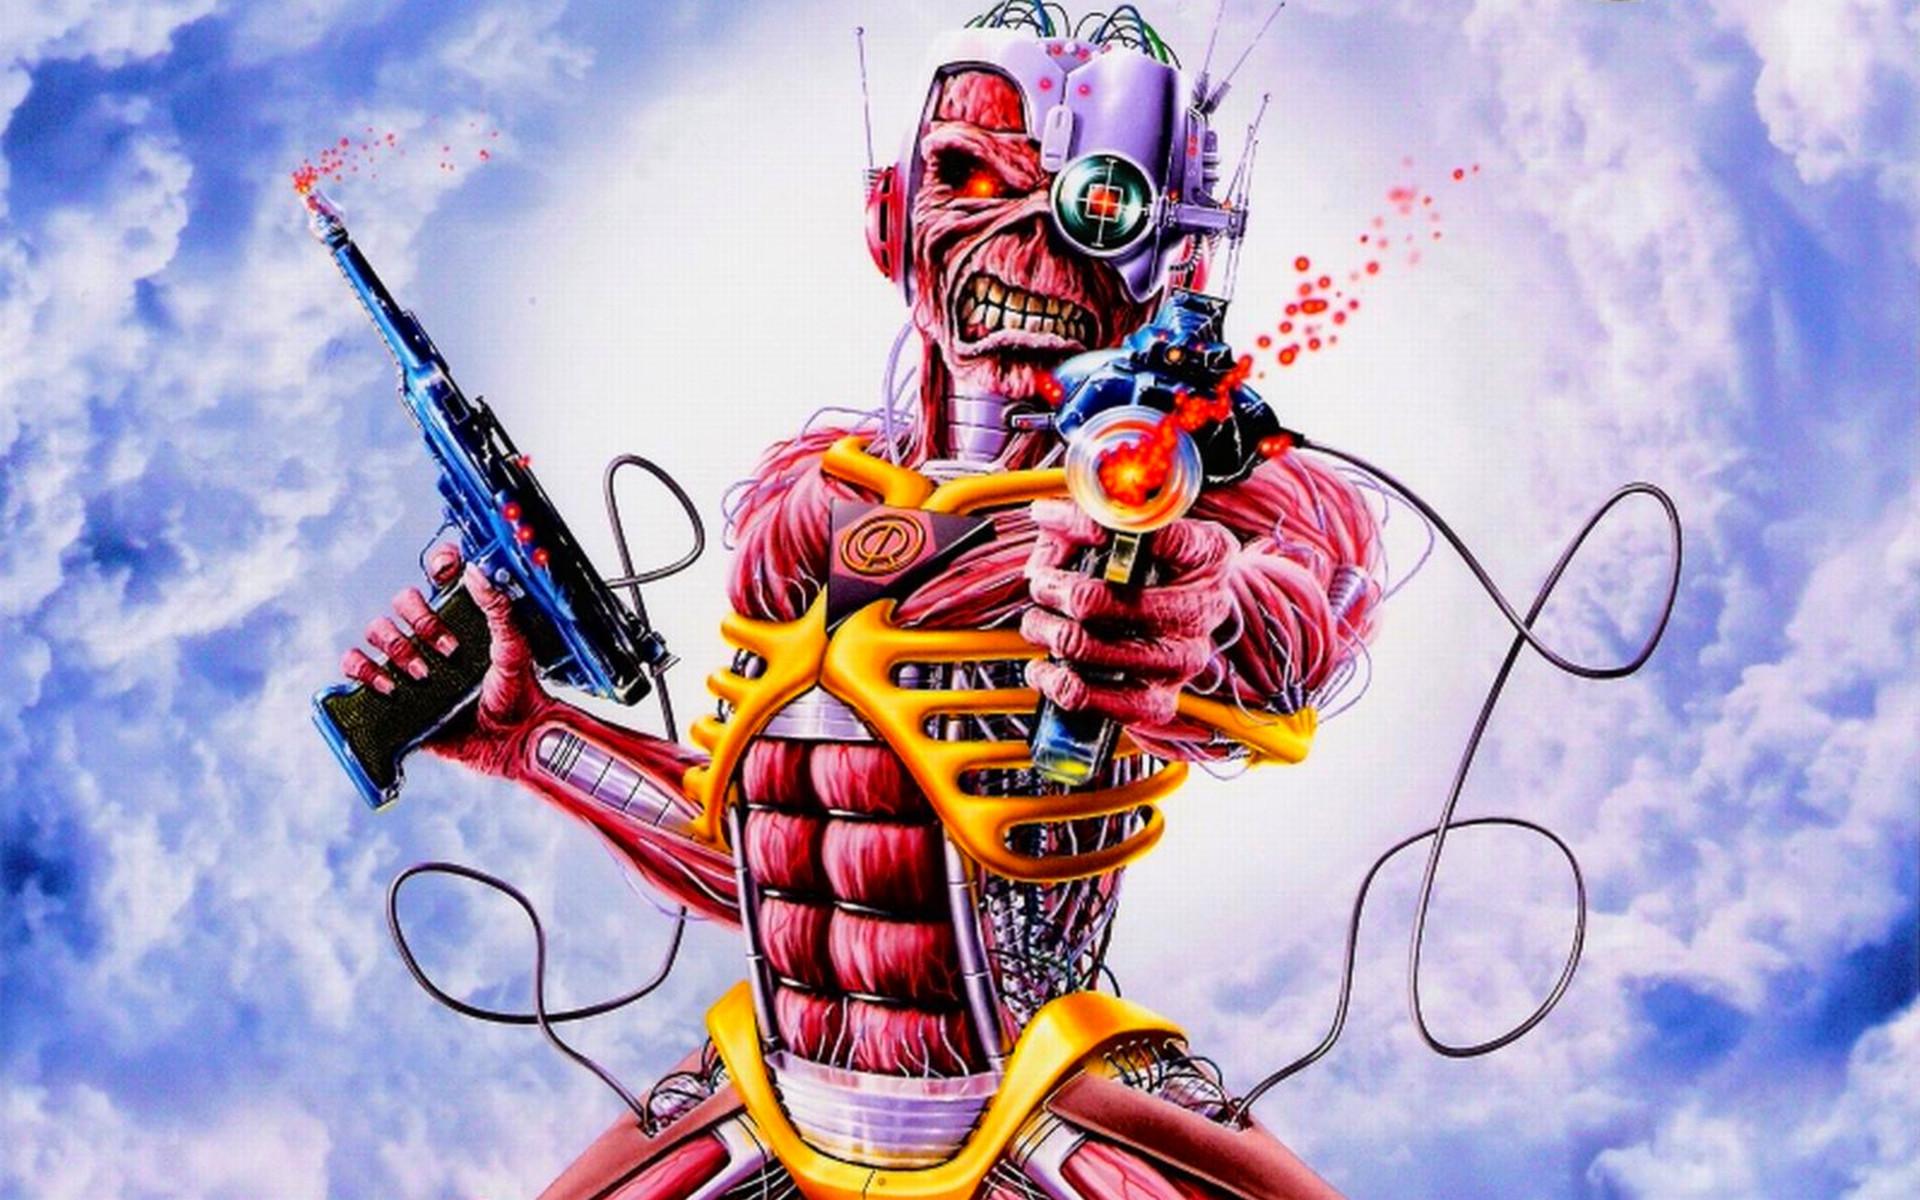 Heavy Metal Movie Wallpaper Hd  52  Images